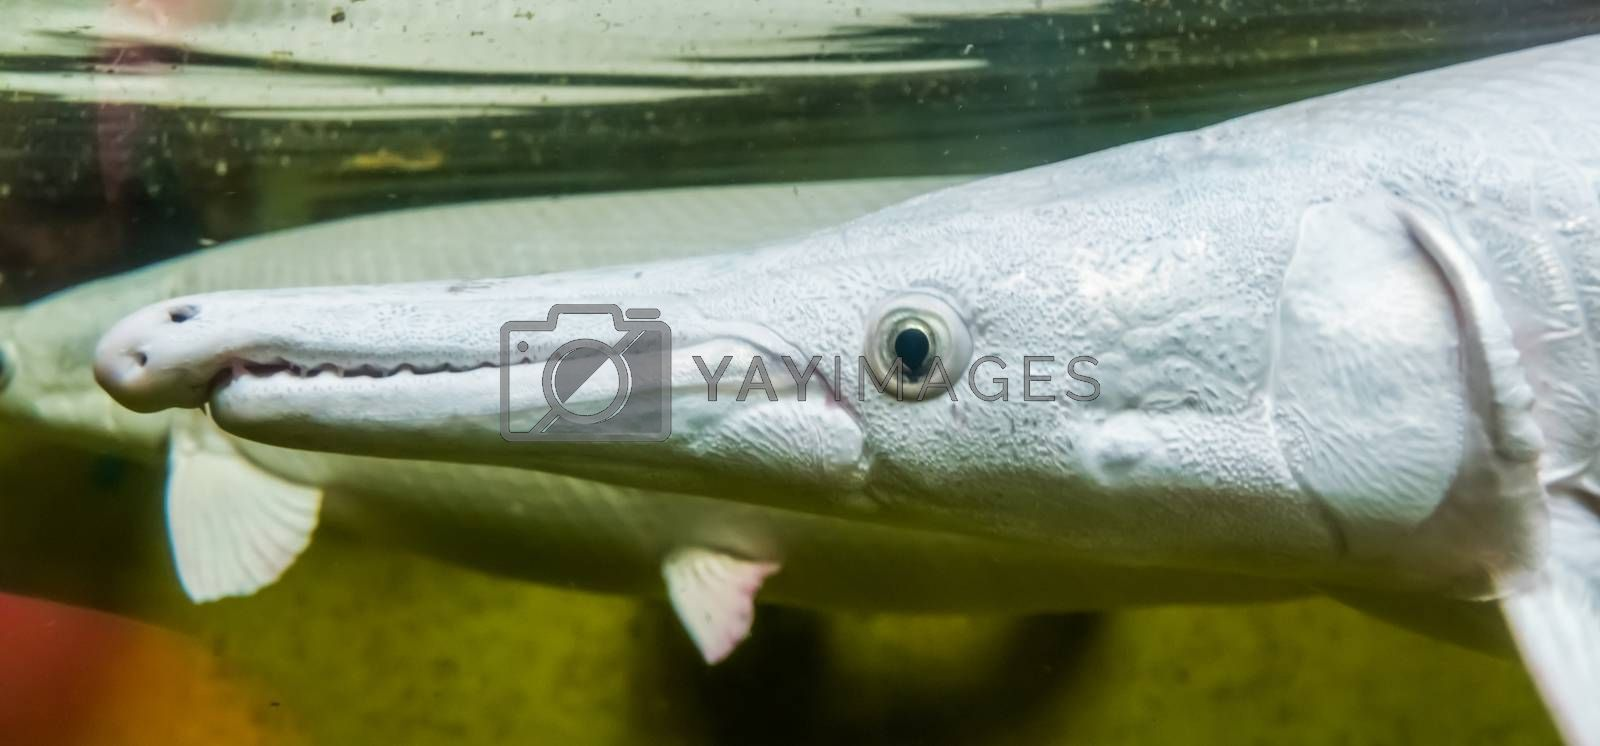 the head of a alligator gar in closeup, popular aquarium pet, tropical fish specie from America